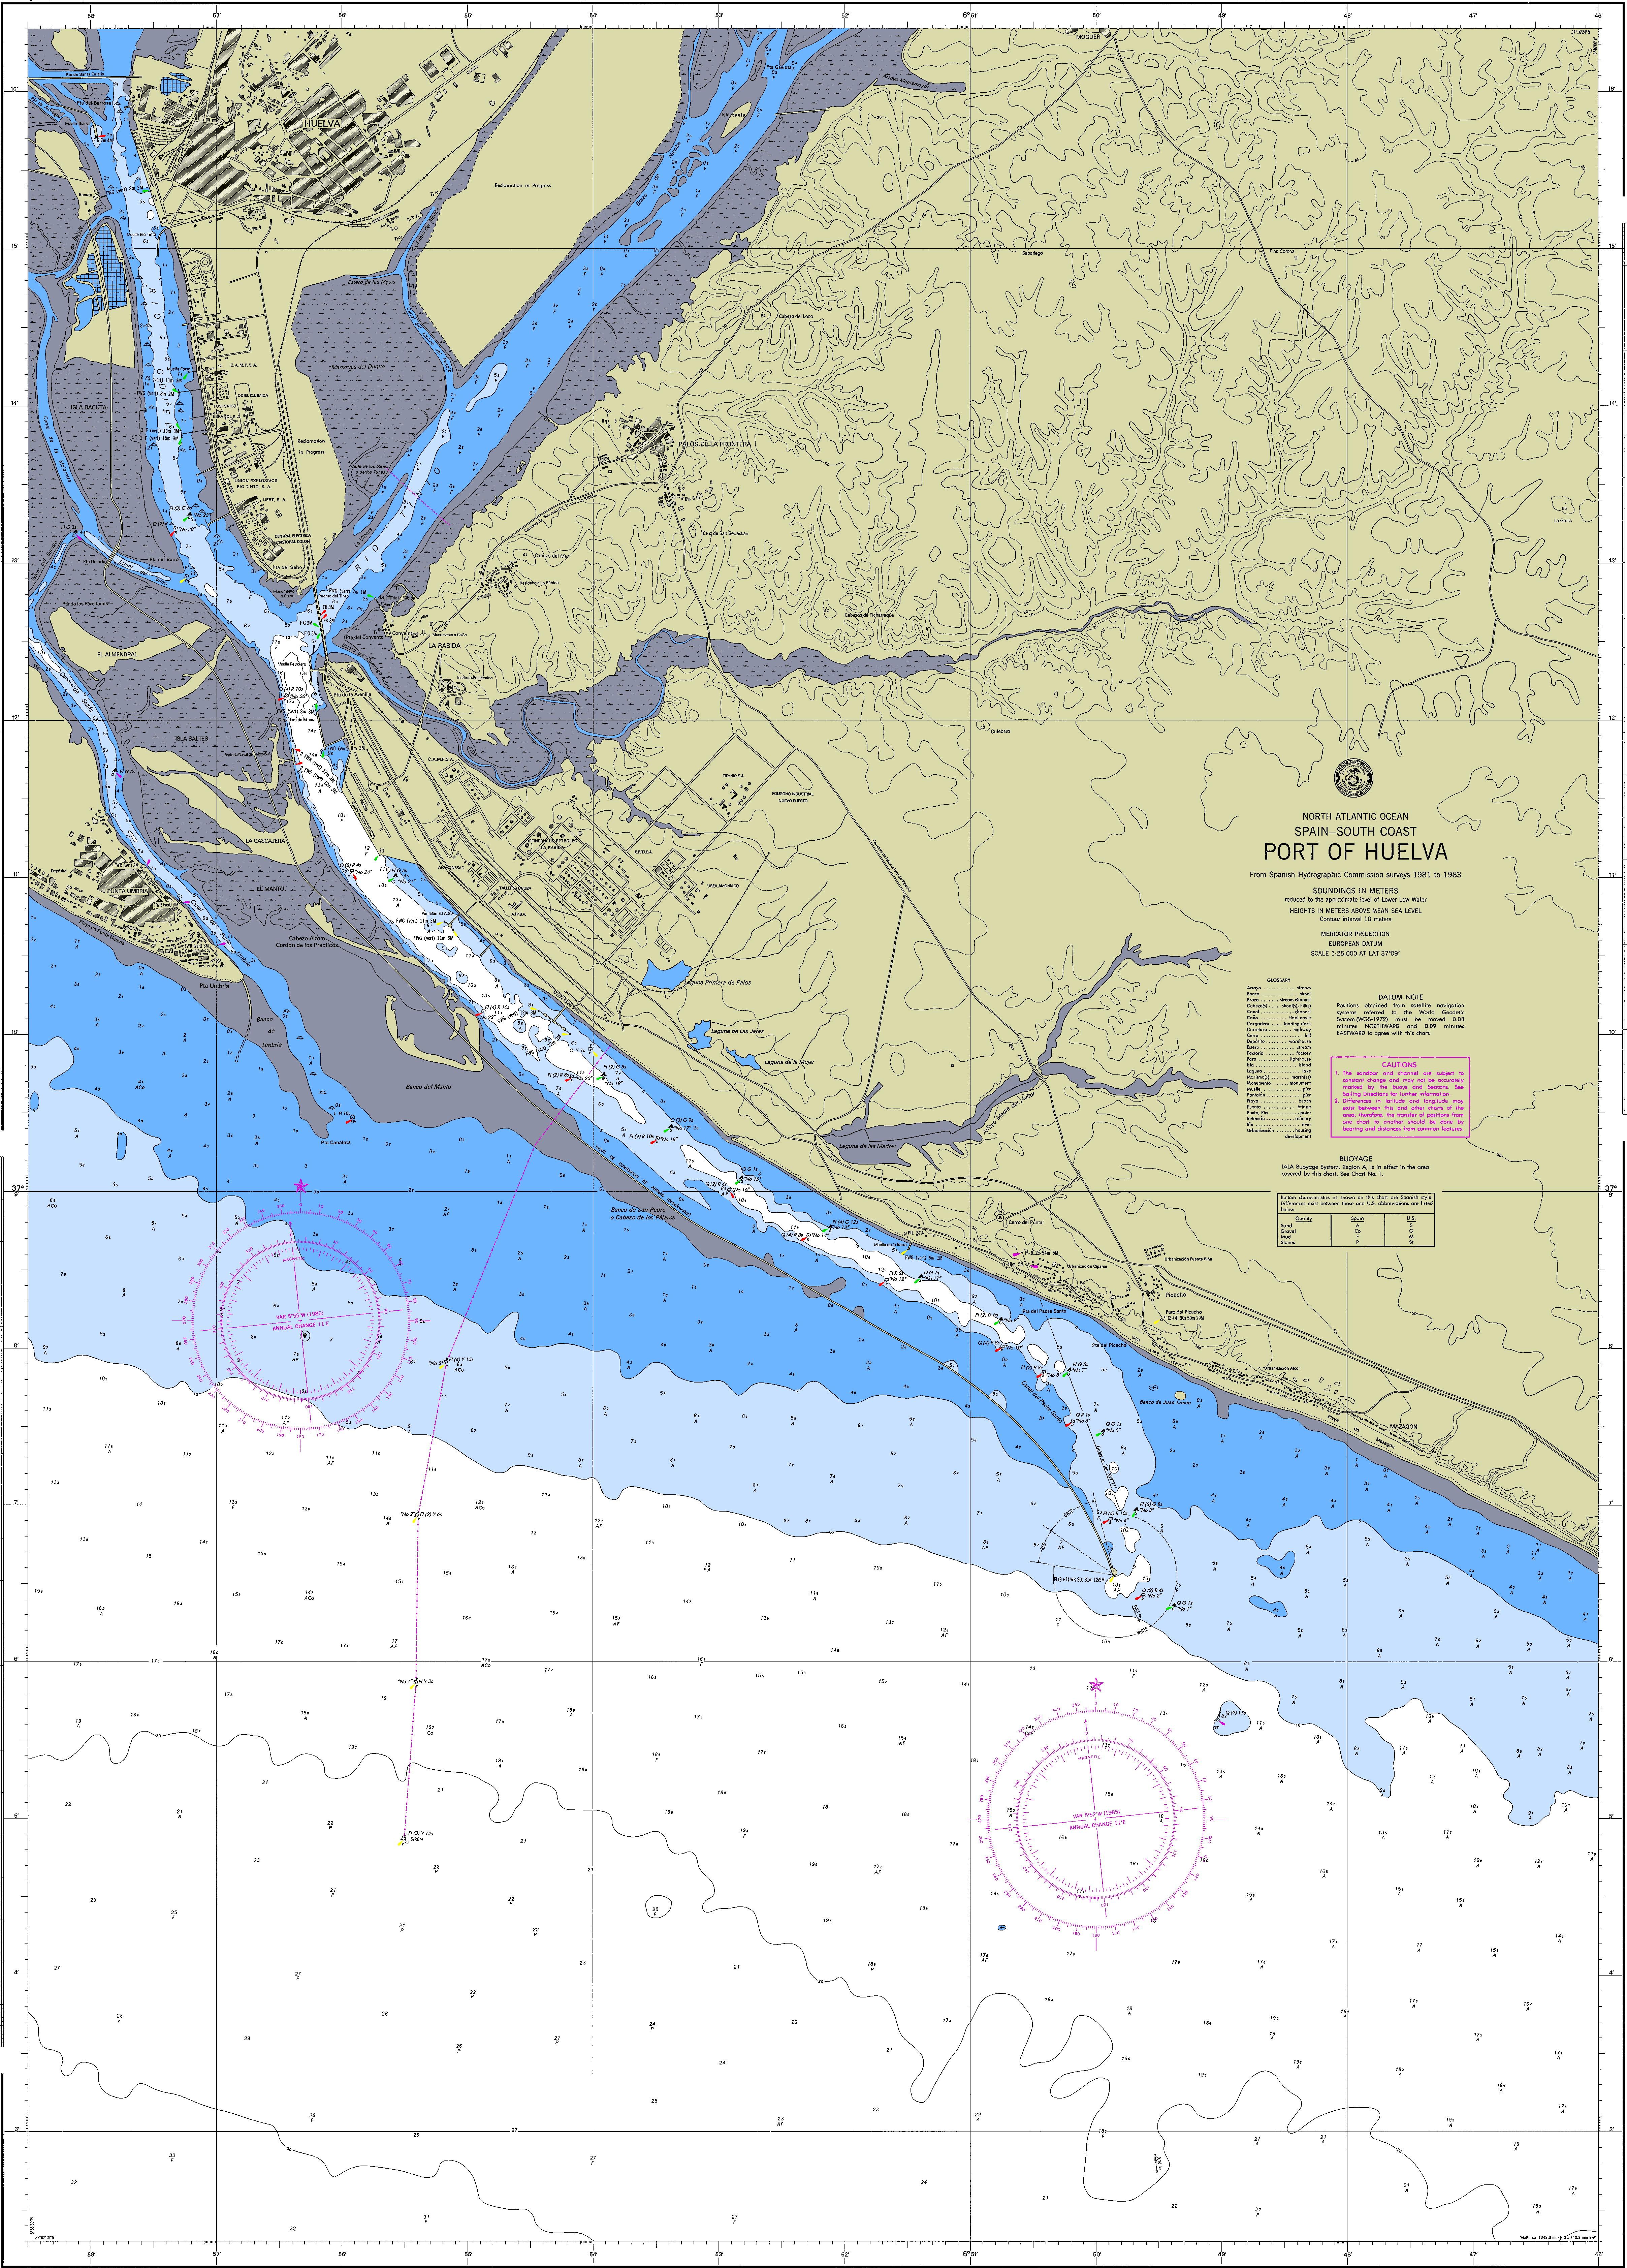 Carta náutica del puerto de Huelva